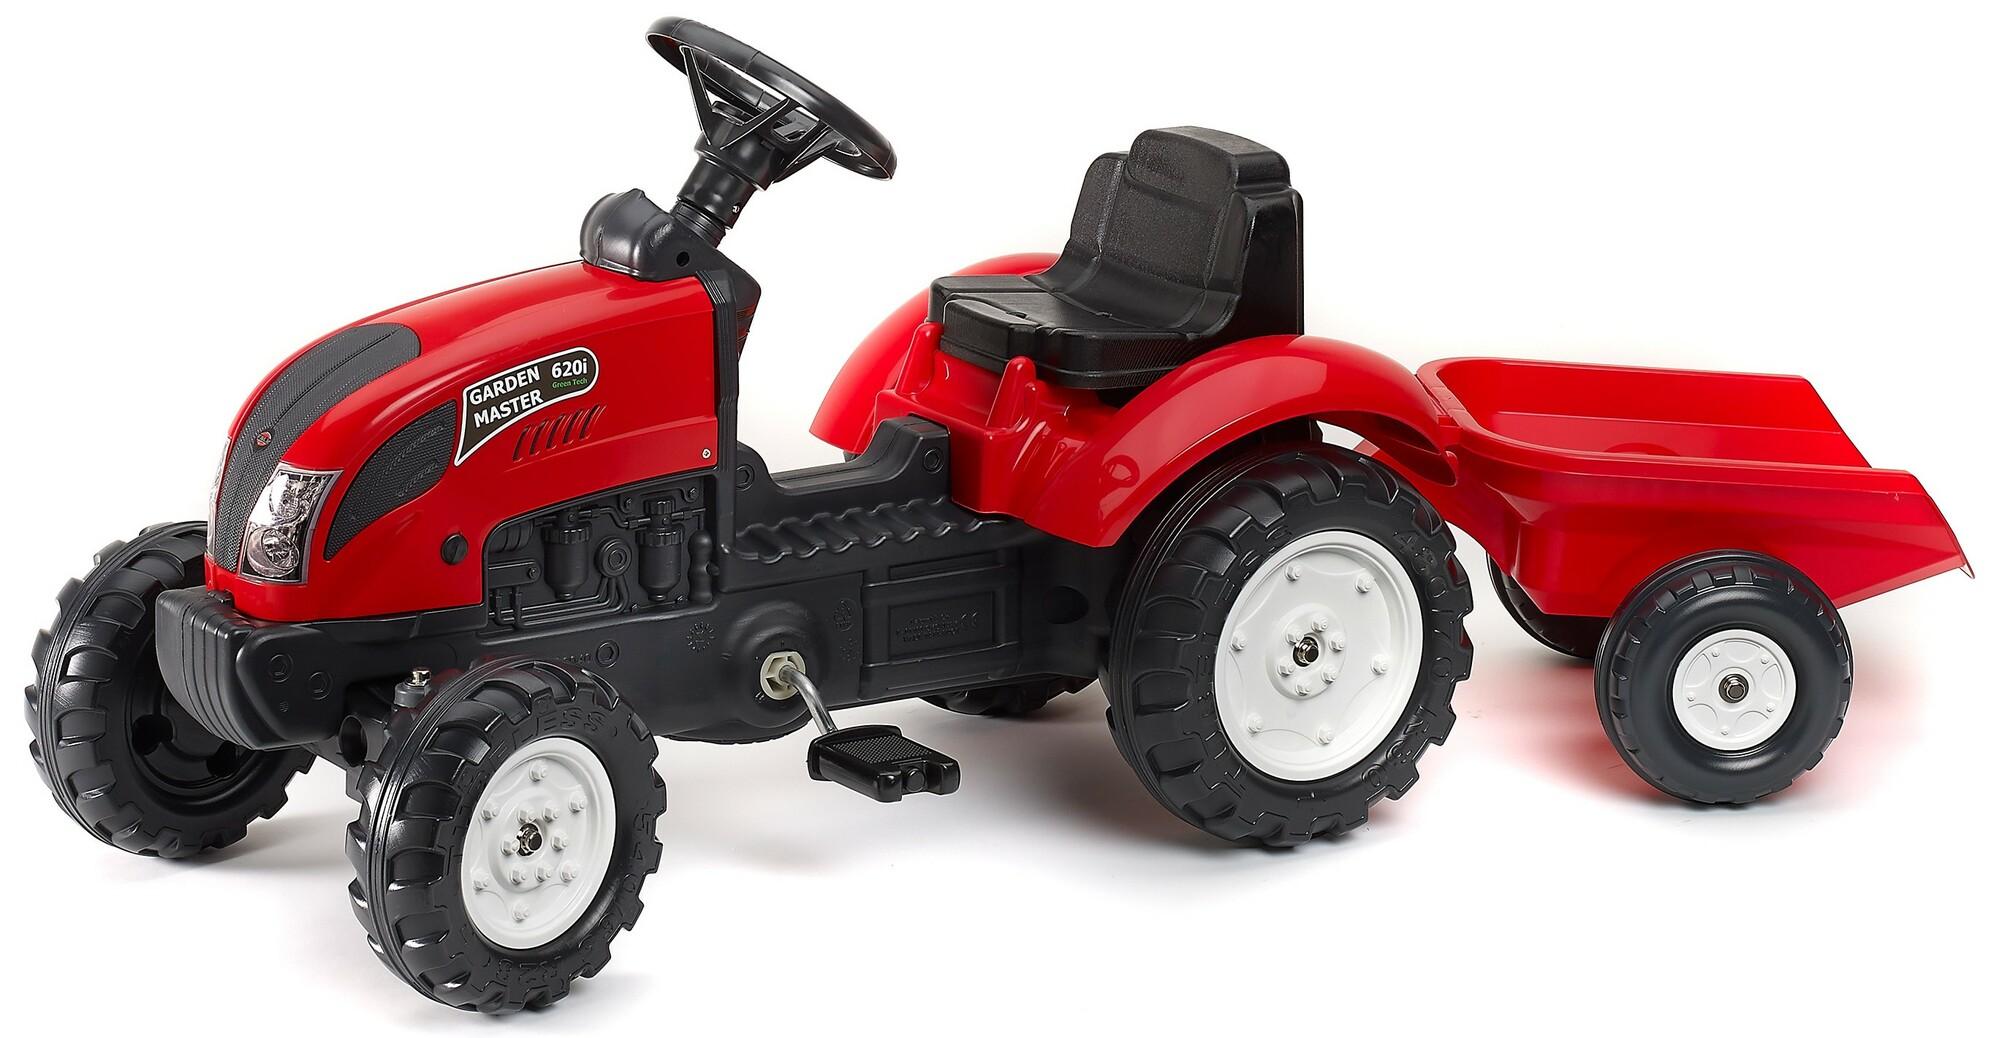 FALK Šliapací traktor 2058J Garden master červený s vlečkou